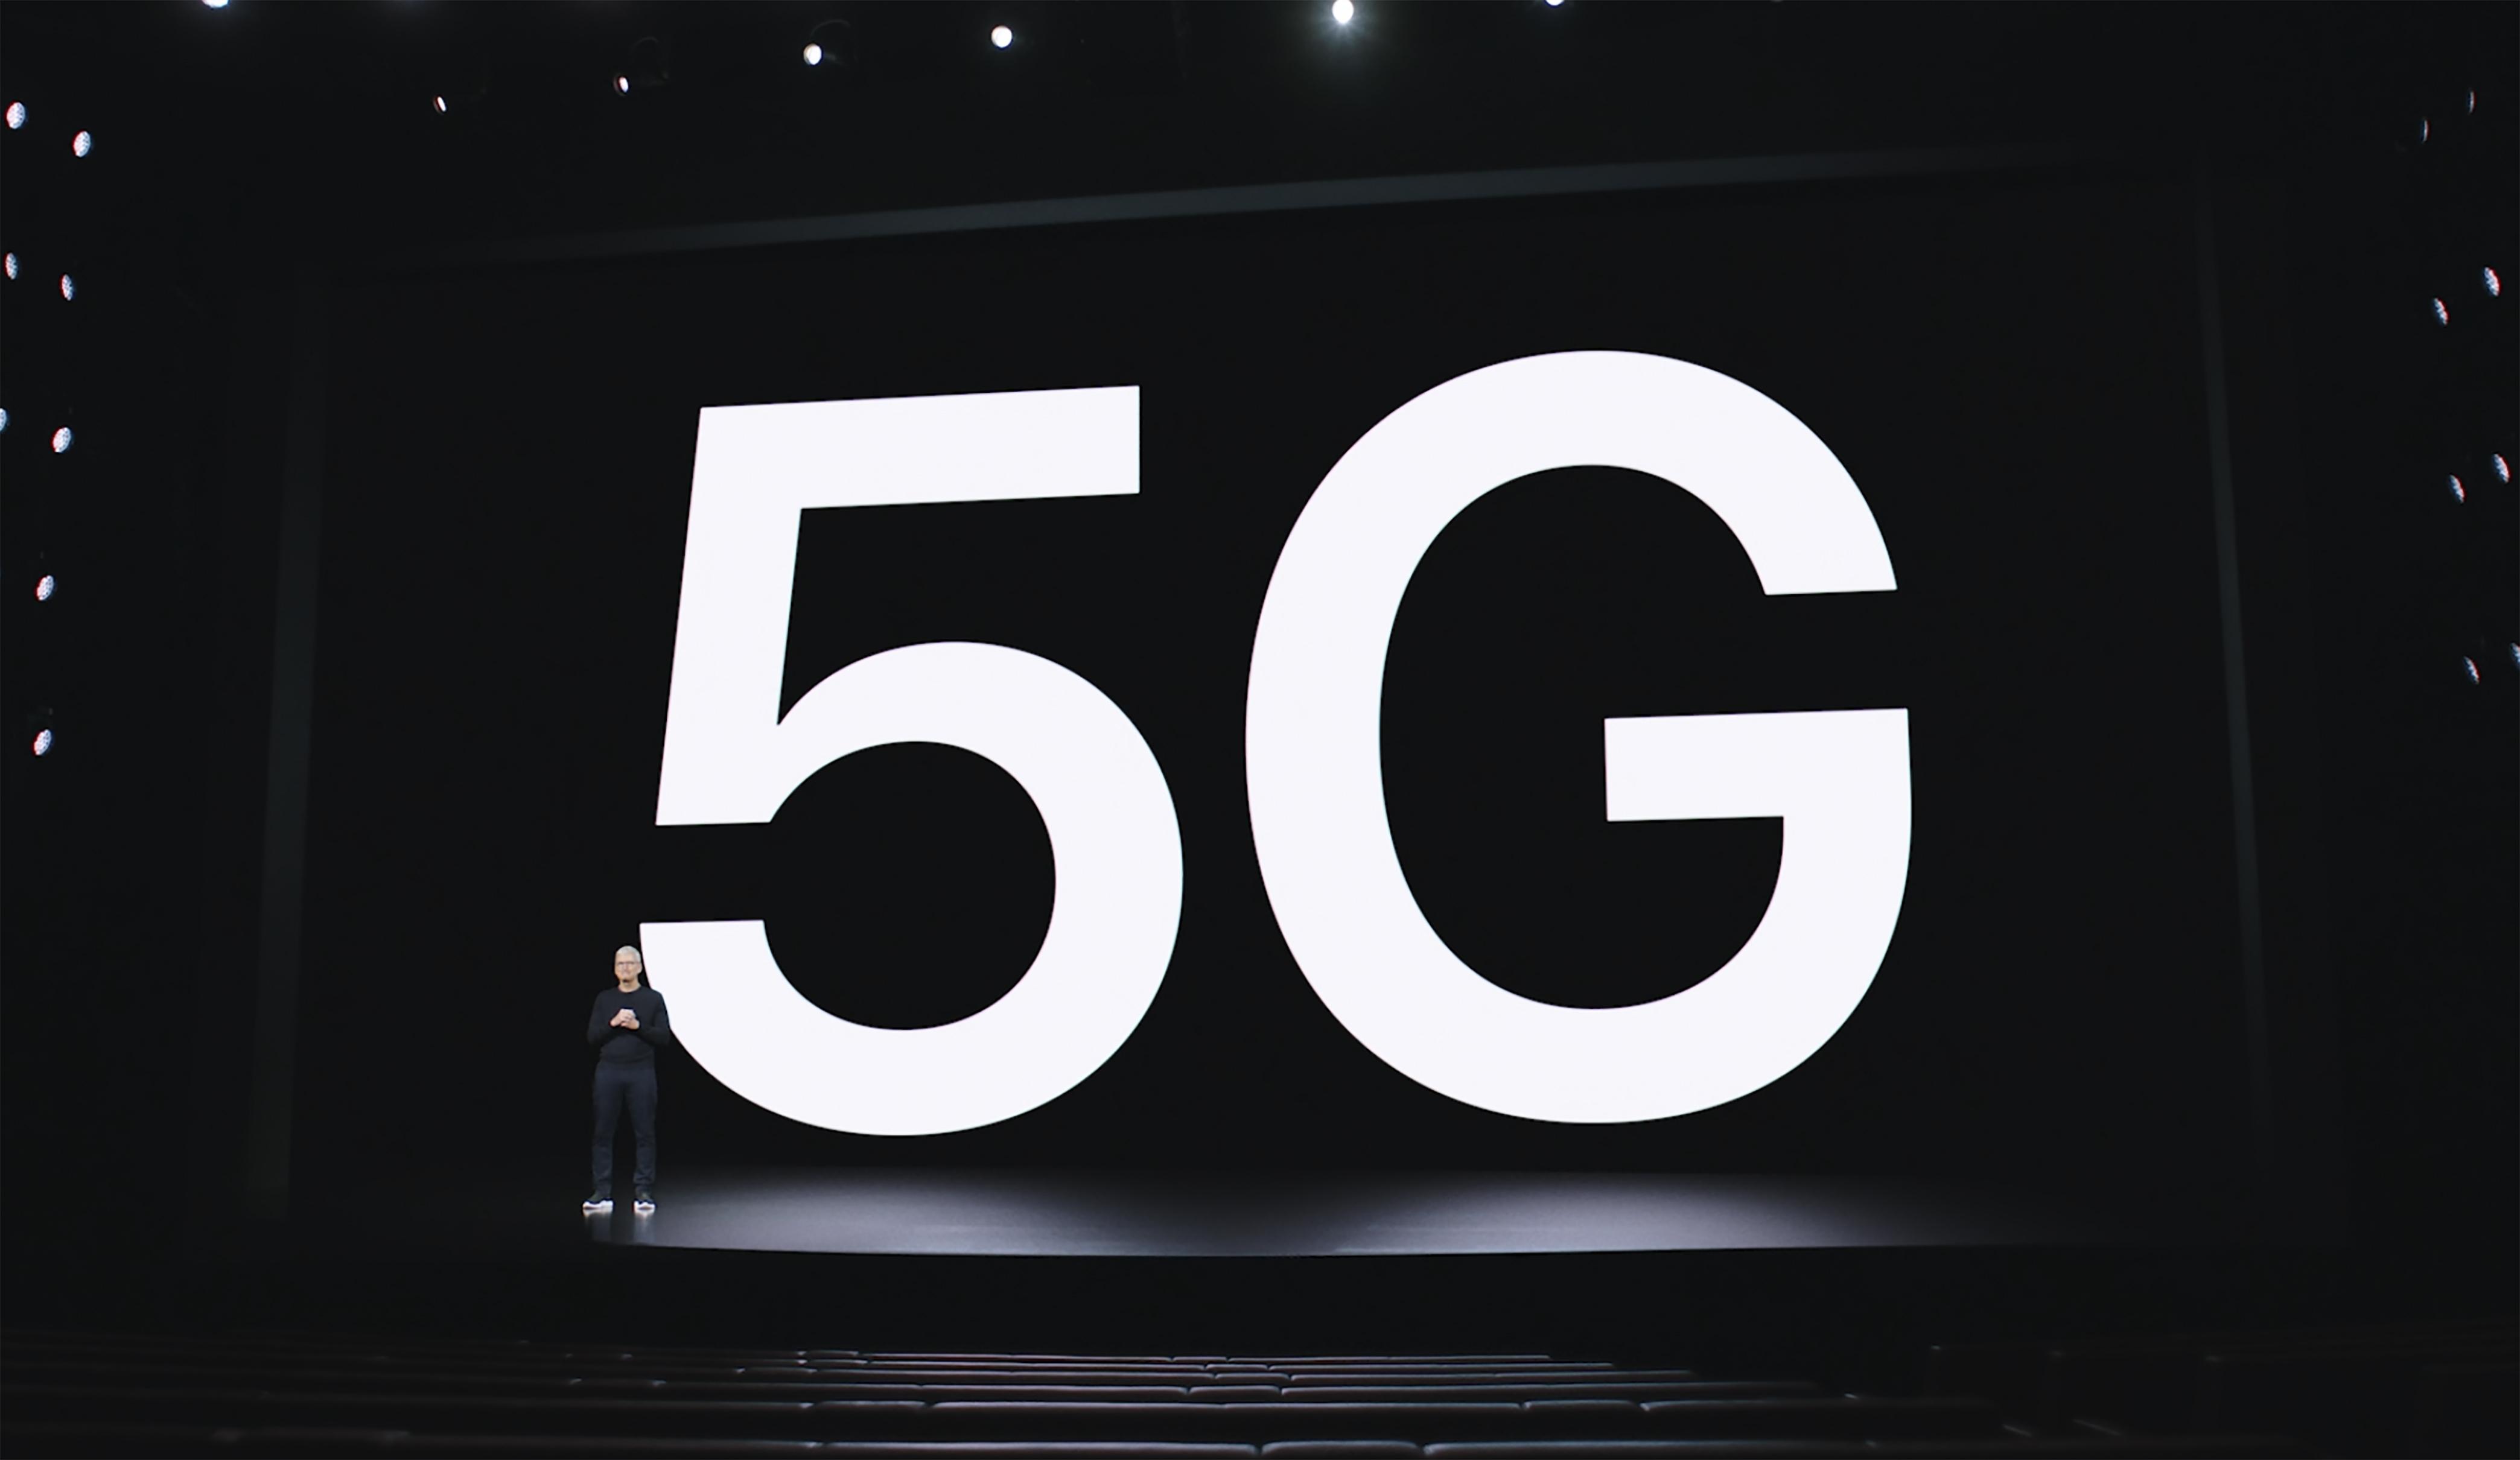 AP Explains: The Promise of 5G Wireless – Speed, Hype, Risk